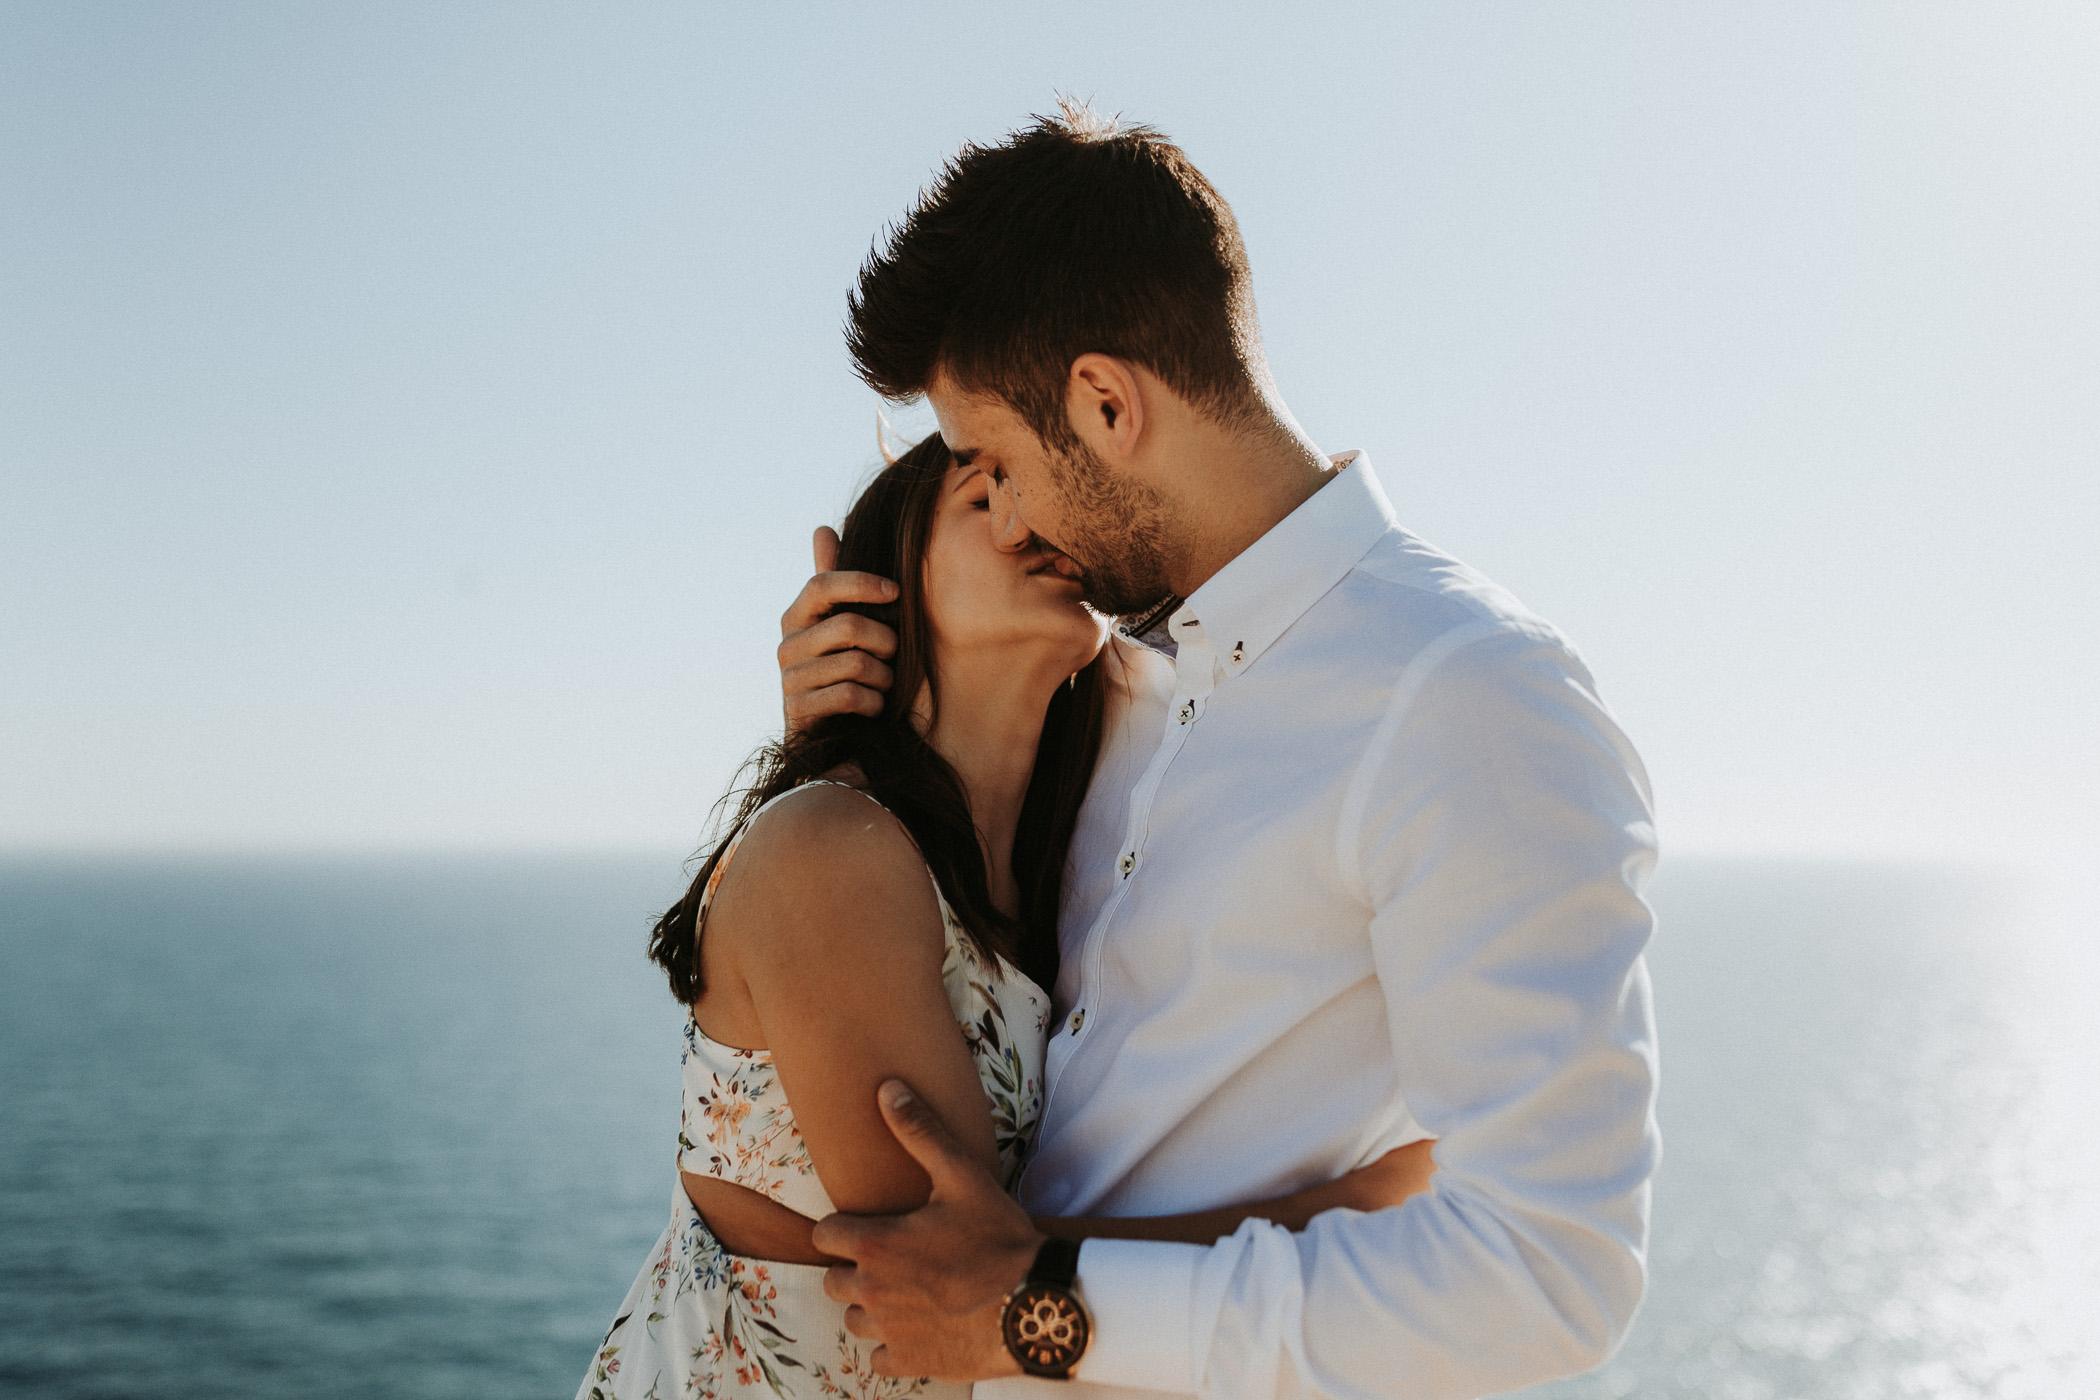 DanielaMarquardtPhotography_wedding_elopement_mallorca_spain_calapi_palma_lauraandtoni_81